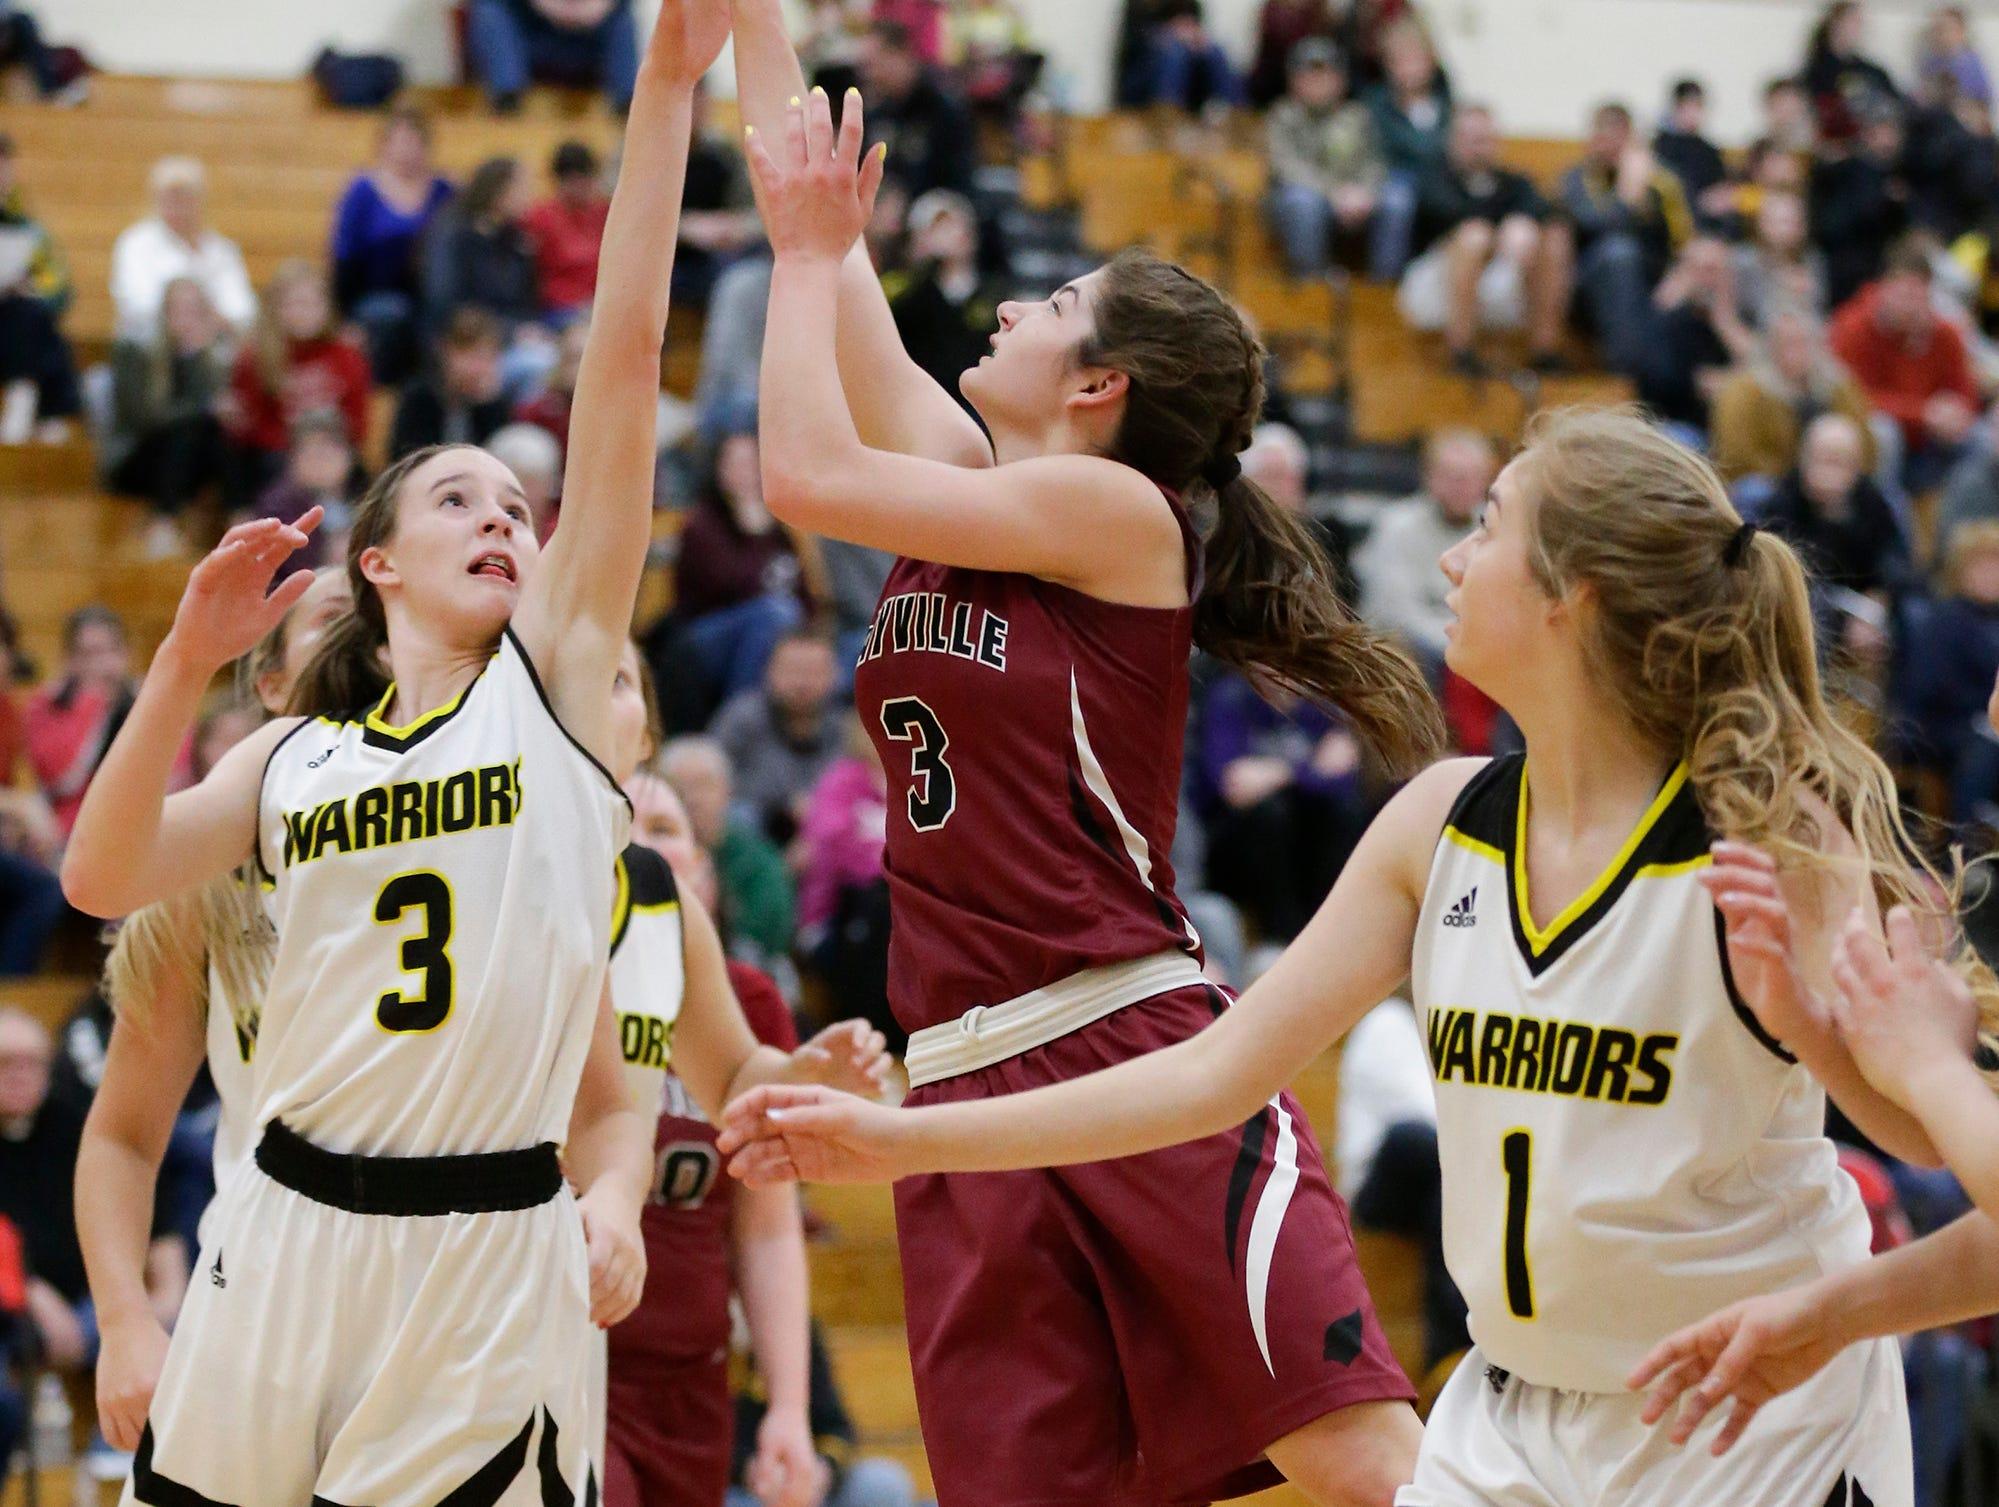 Mayville High School girls basketball's Amber Schraufnagel (3) shoots a basket against Waupun High School's Abbie Aalsma (3) Saturday, February 23, 2019 during their WIAA Division 4 sectional quarterfinal game in Waupun. Waupun won the game 62-45. Doug Raflik/USA TODAY NETWORK-Wisconsin